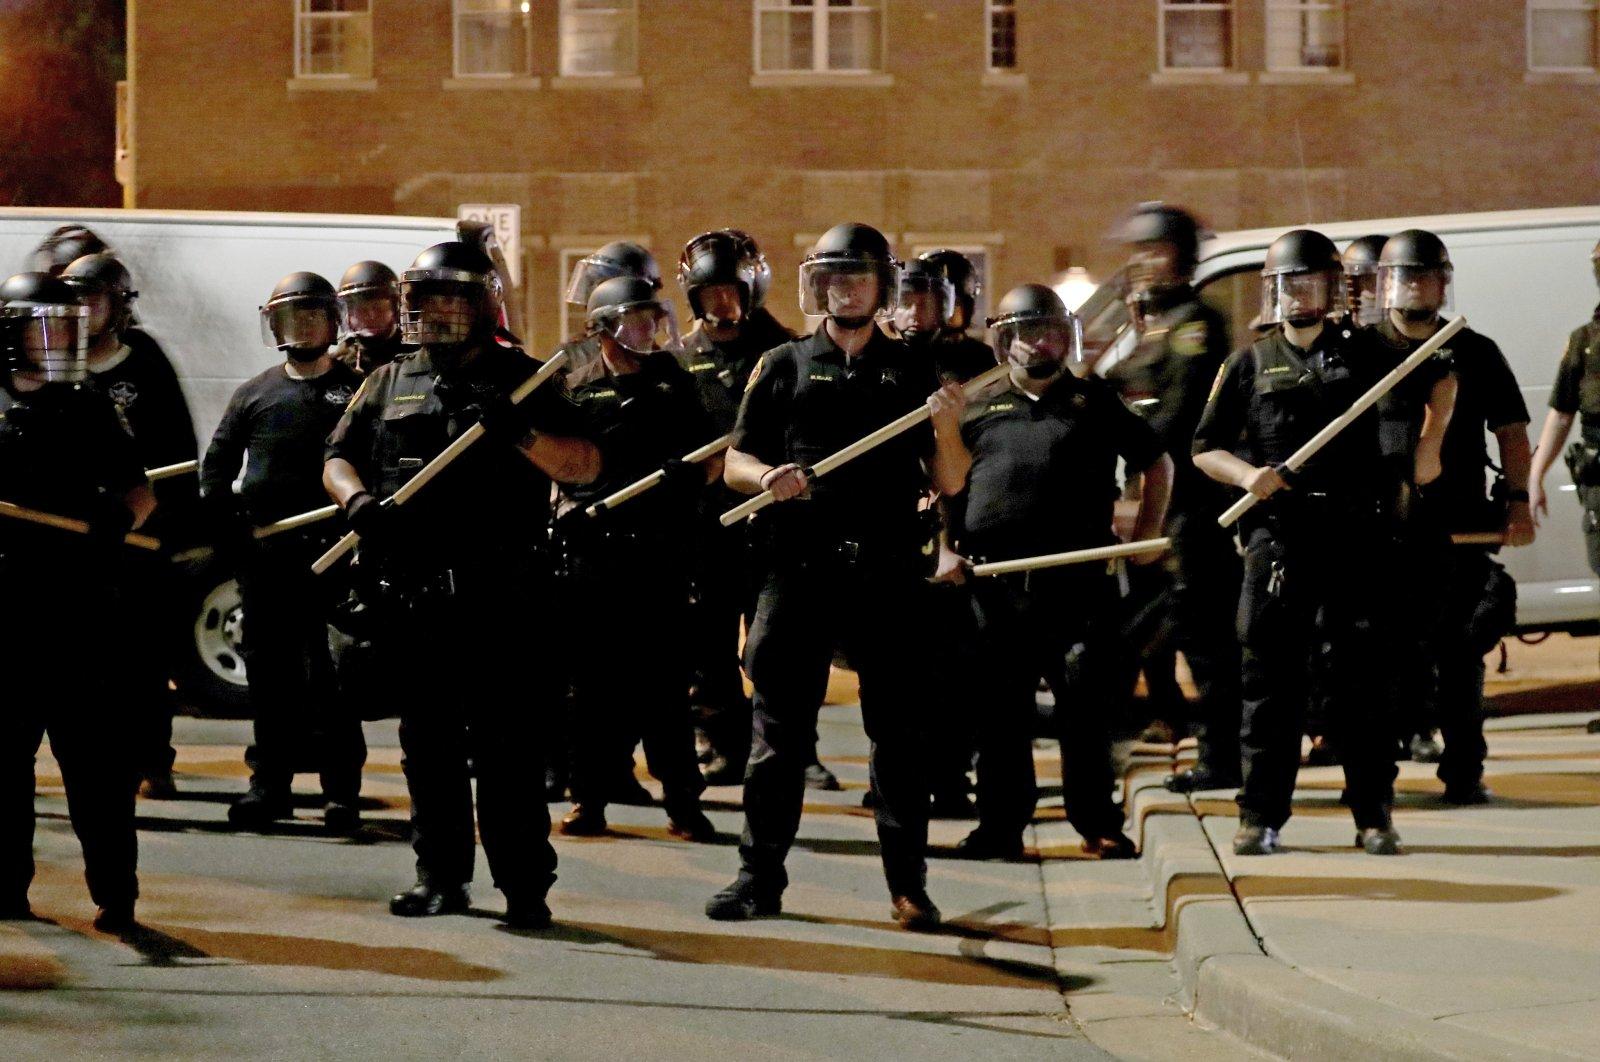 Police in riot gear stand guard in Kenosha, Wisconsin, U.S., Aug. 23, 2020. (Milwaukee Journal-Sentinel via AP)